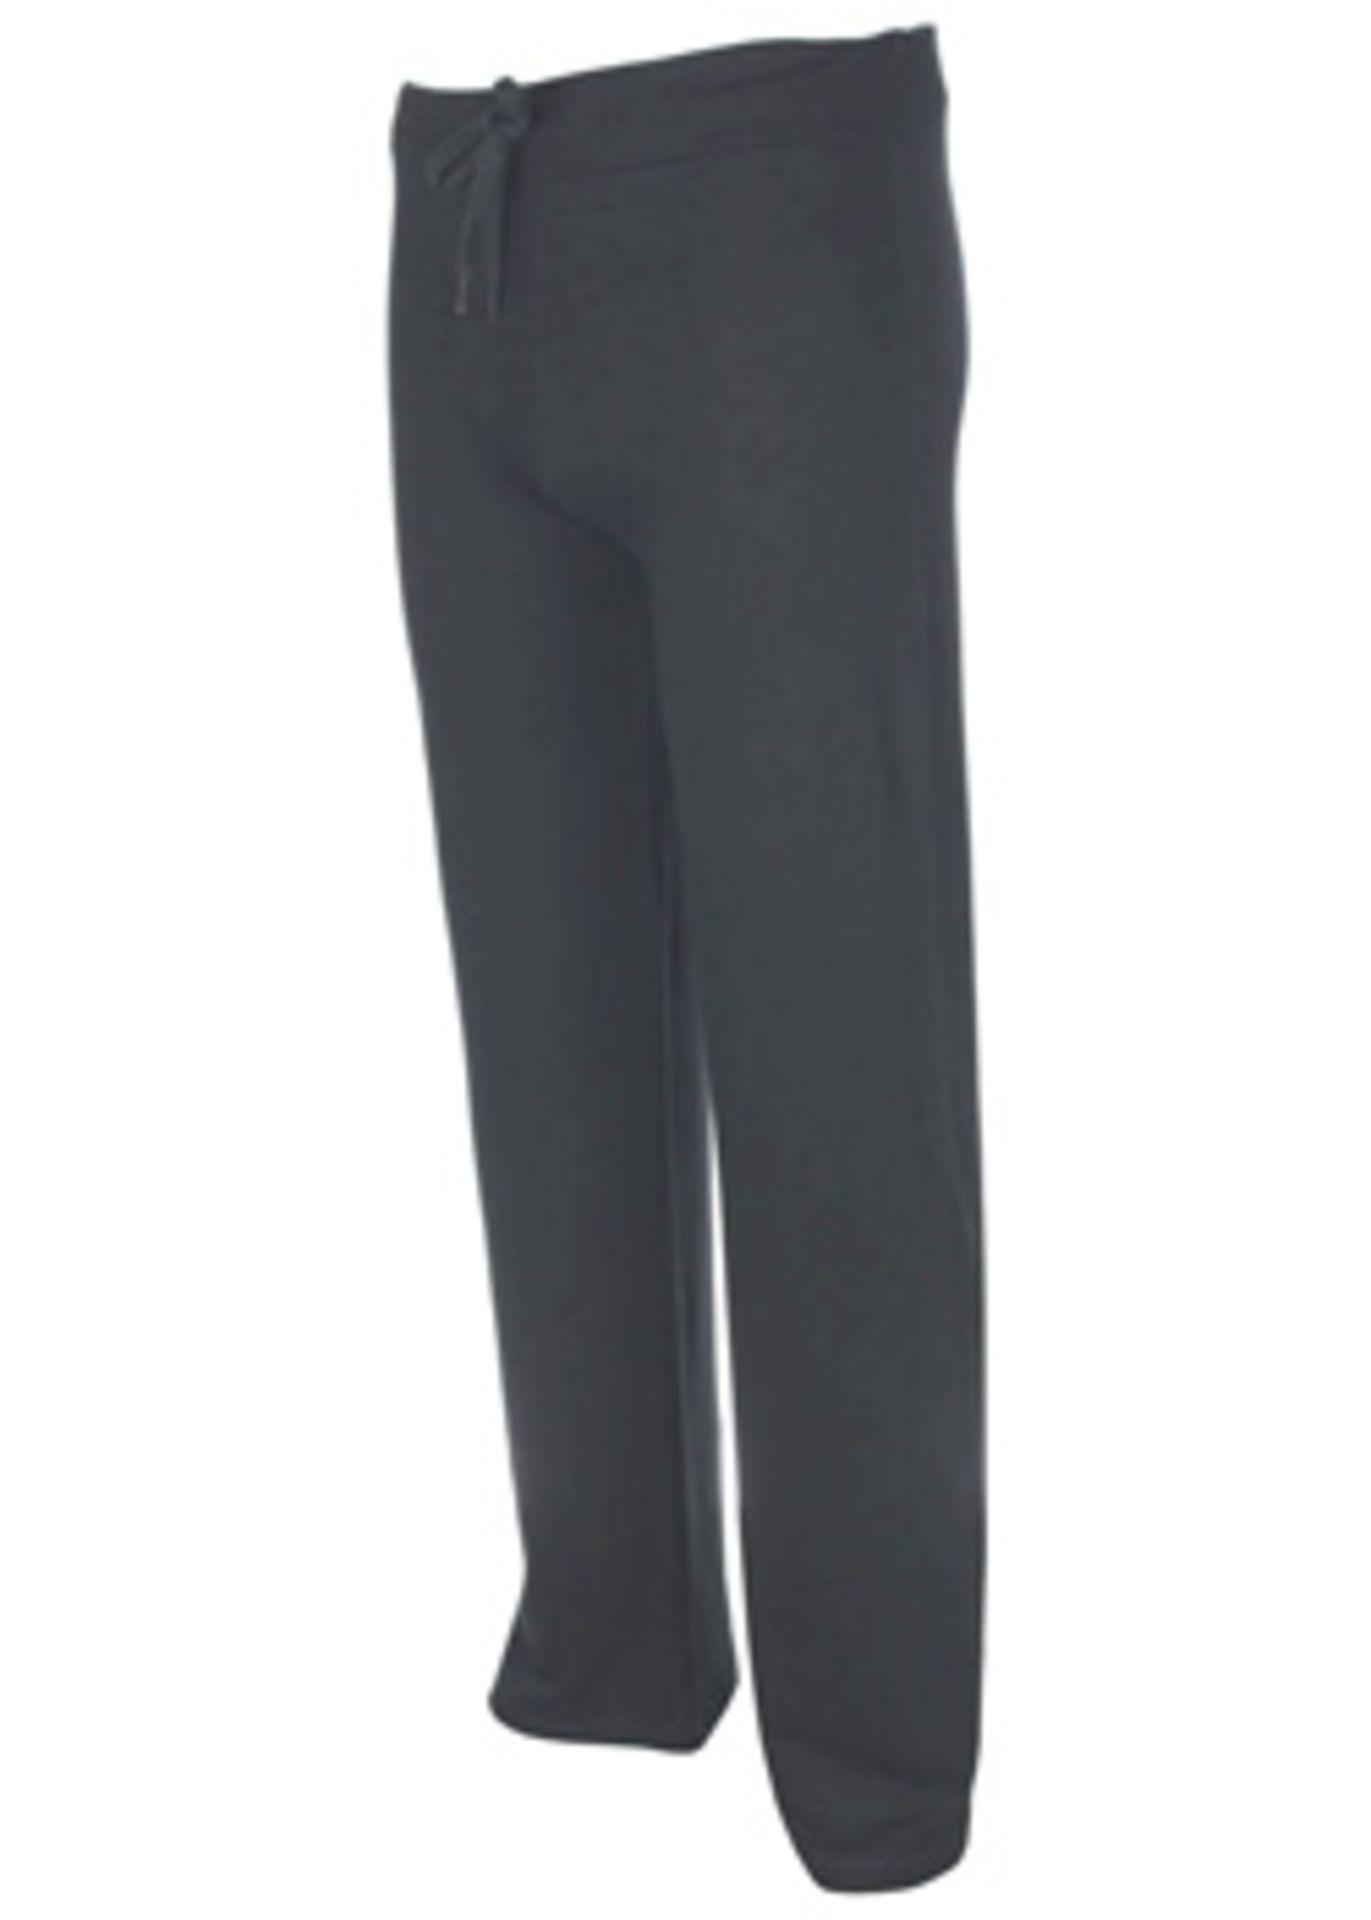 2 x Pairs Men's Yoga Pants | Large - Image 2 of 2